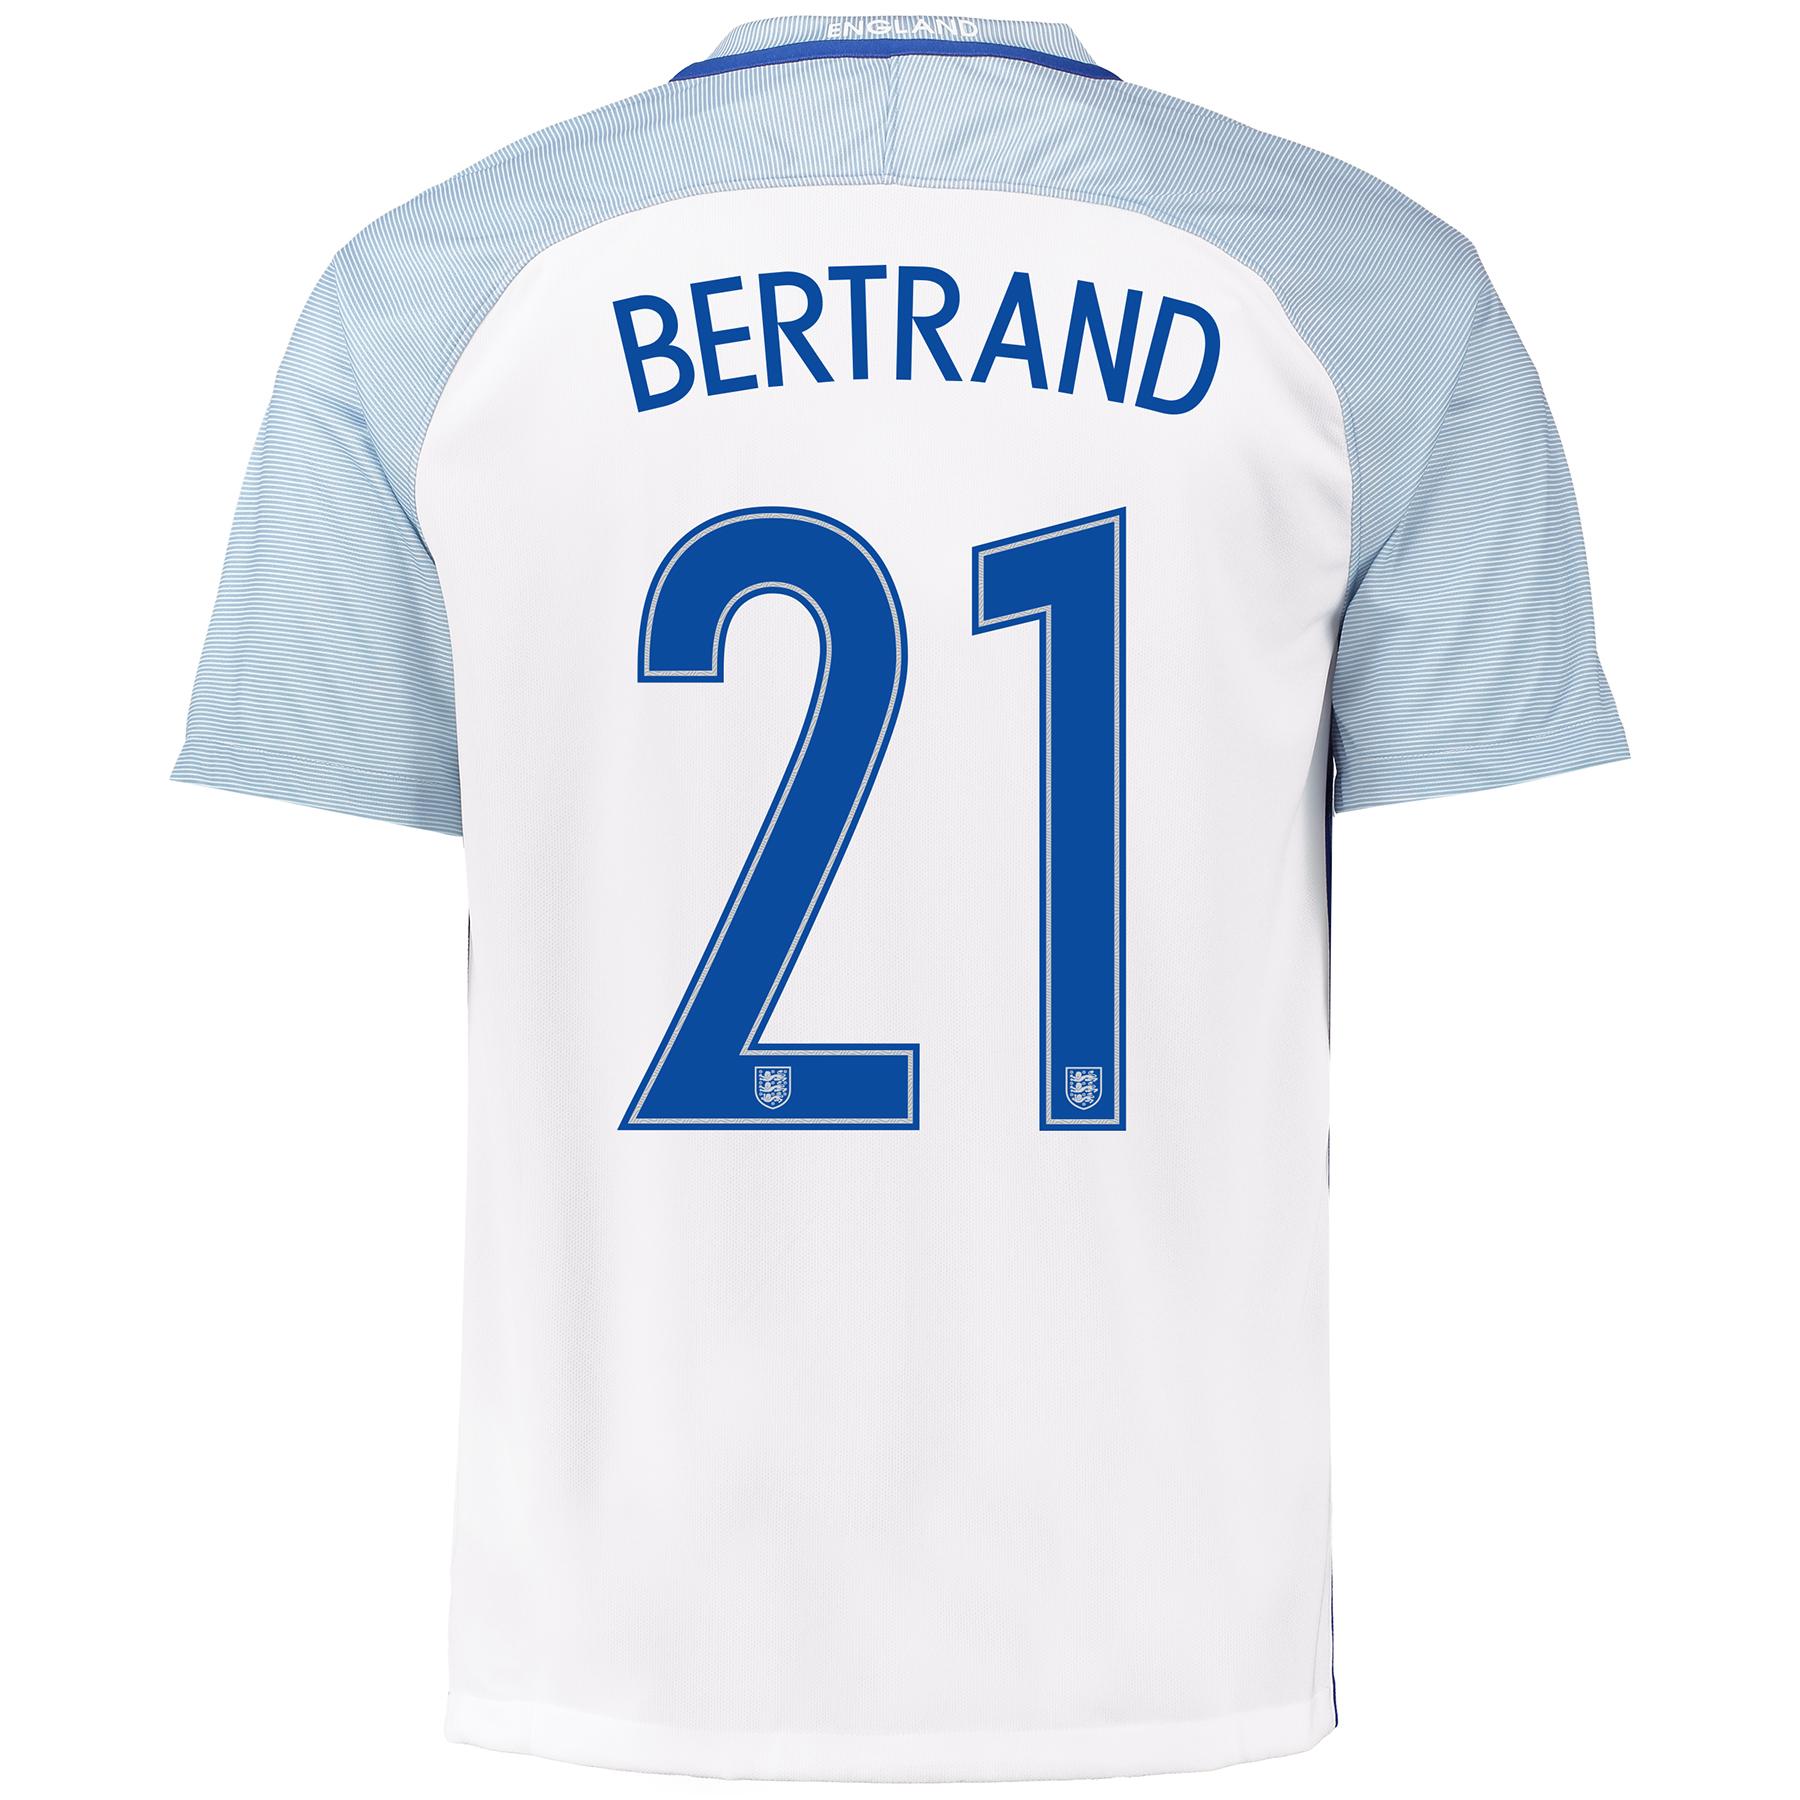 England Home Shirt 2016 with Bertrand 21 printing